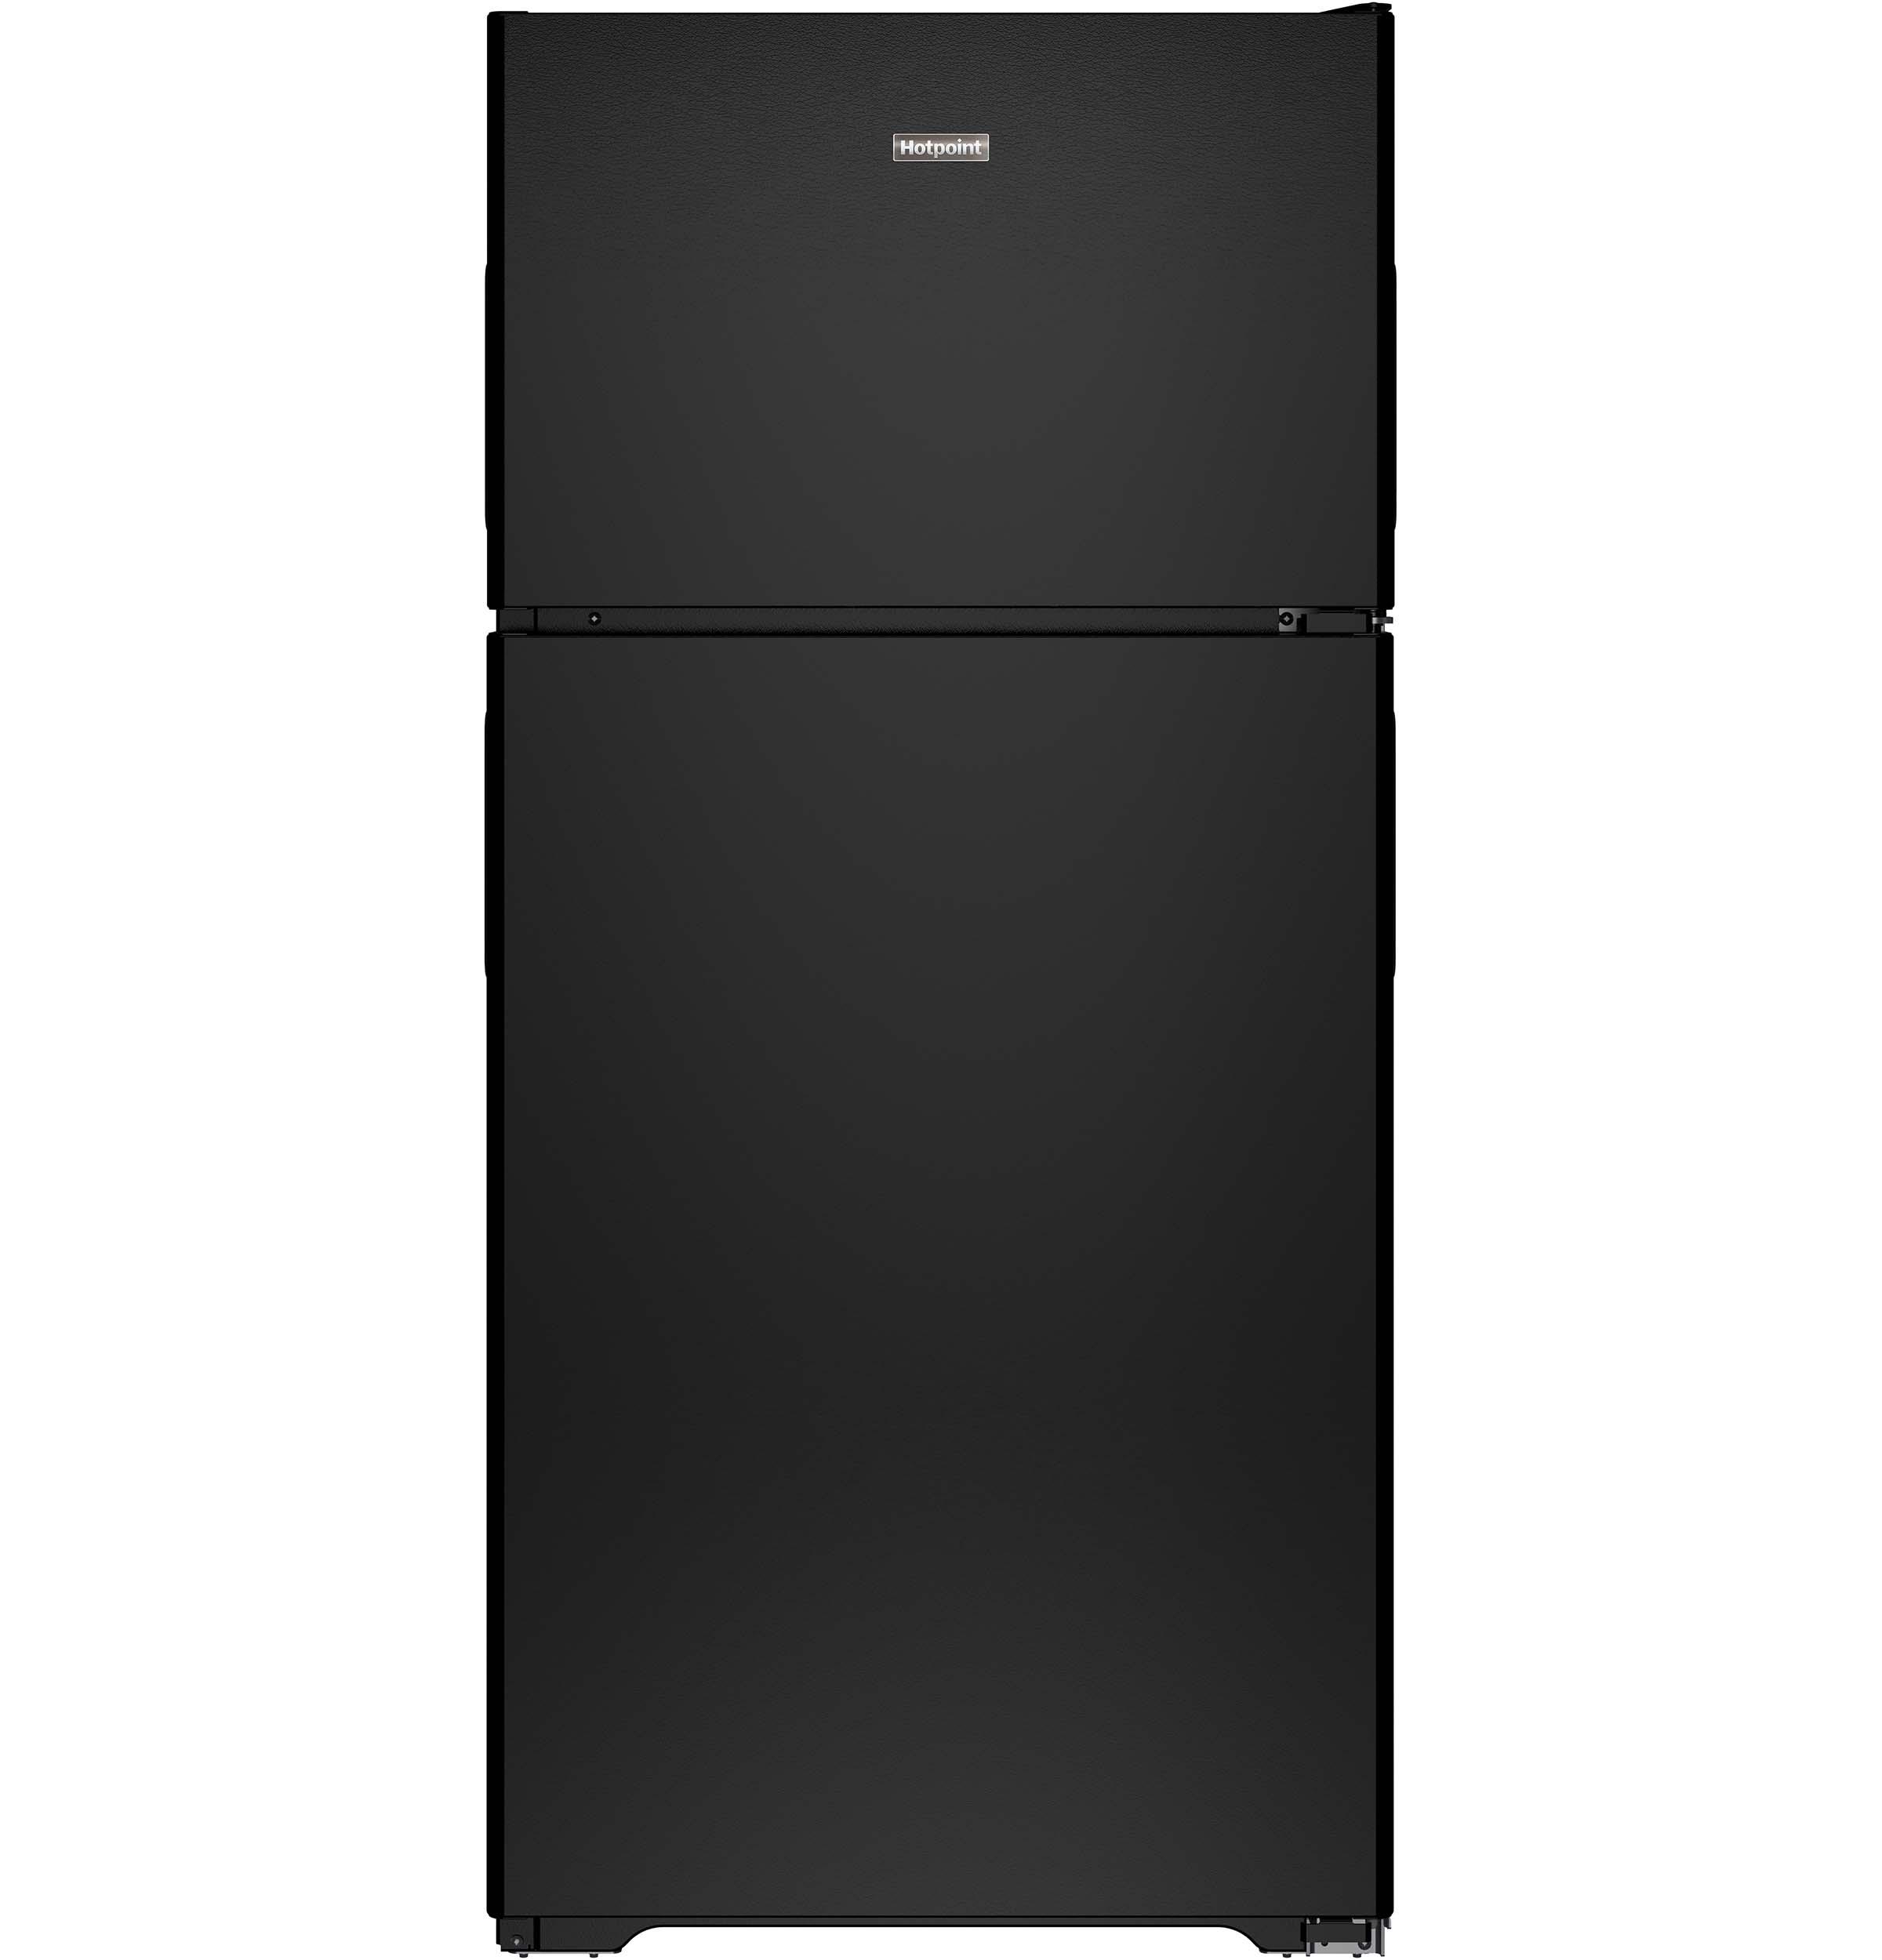 Hotpoint Hotpoint® 14.6 Cu. Ft. Recessed Handle Top-Freezer Refrigerator